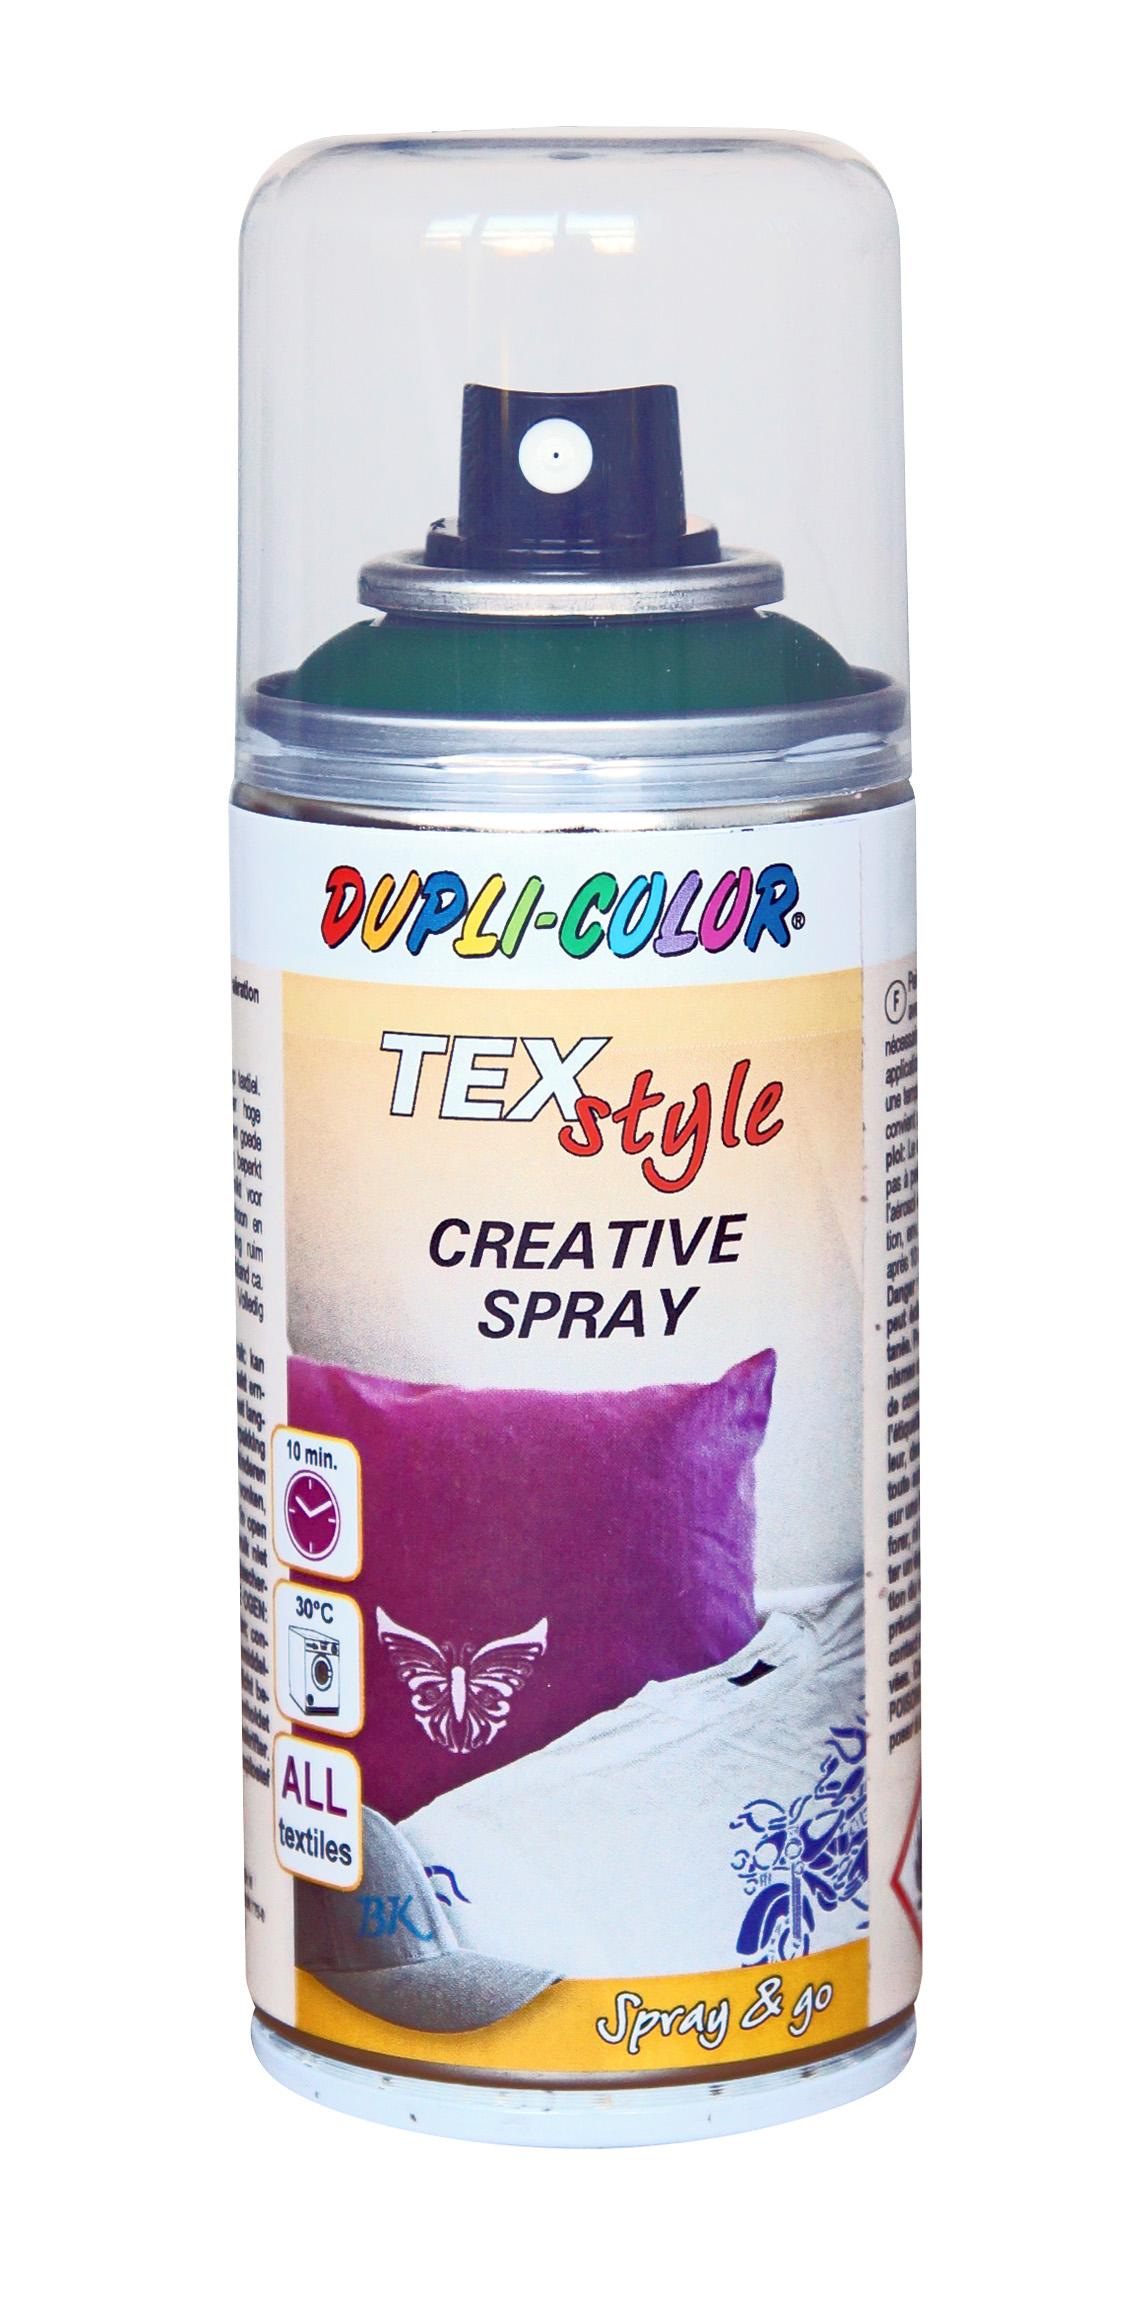 1dbf88f9f Dupli Color TexStyle sprej na textil 3,90€ - Farlesk eshop